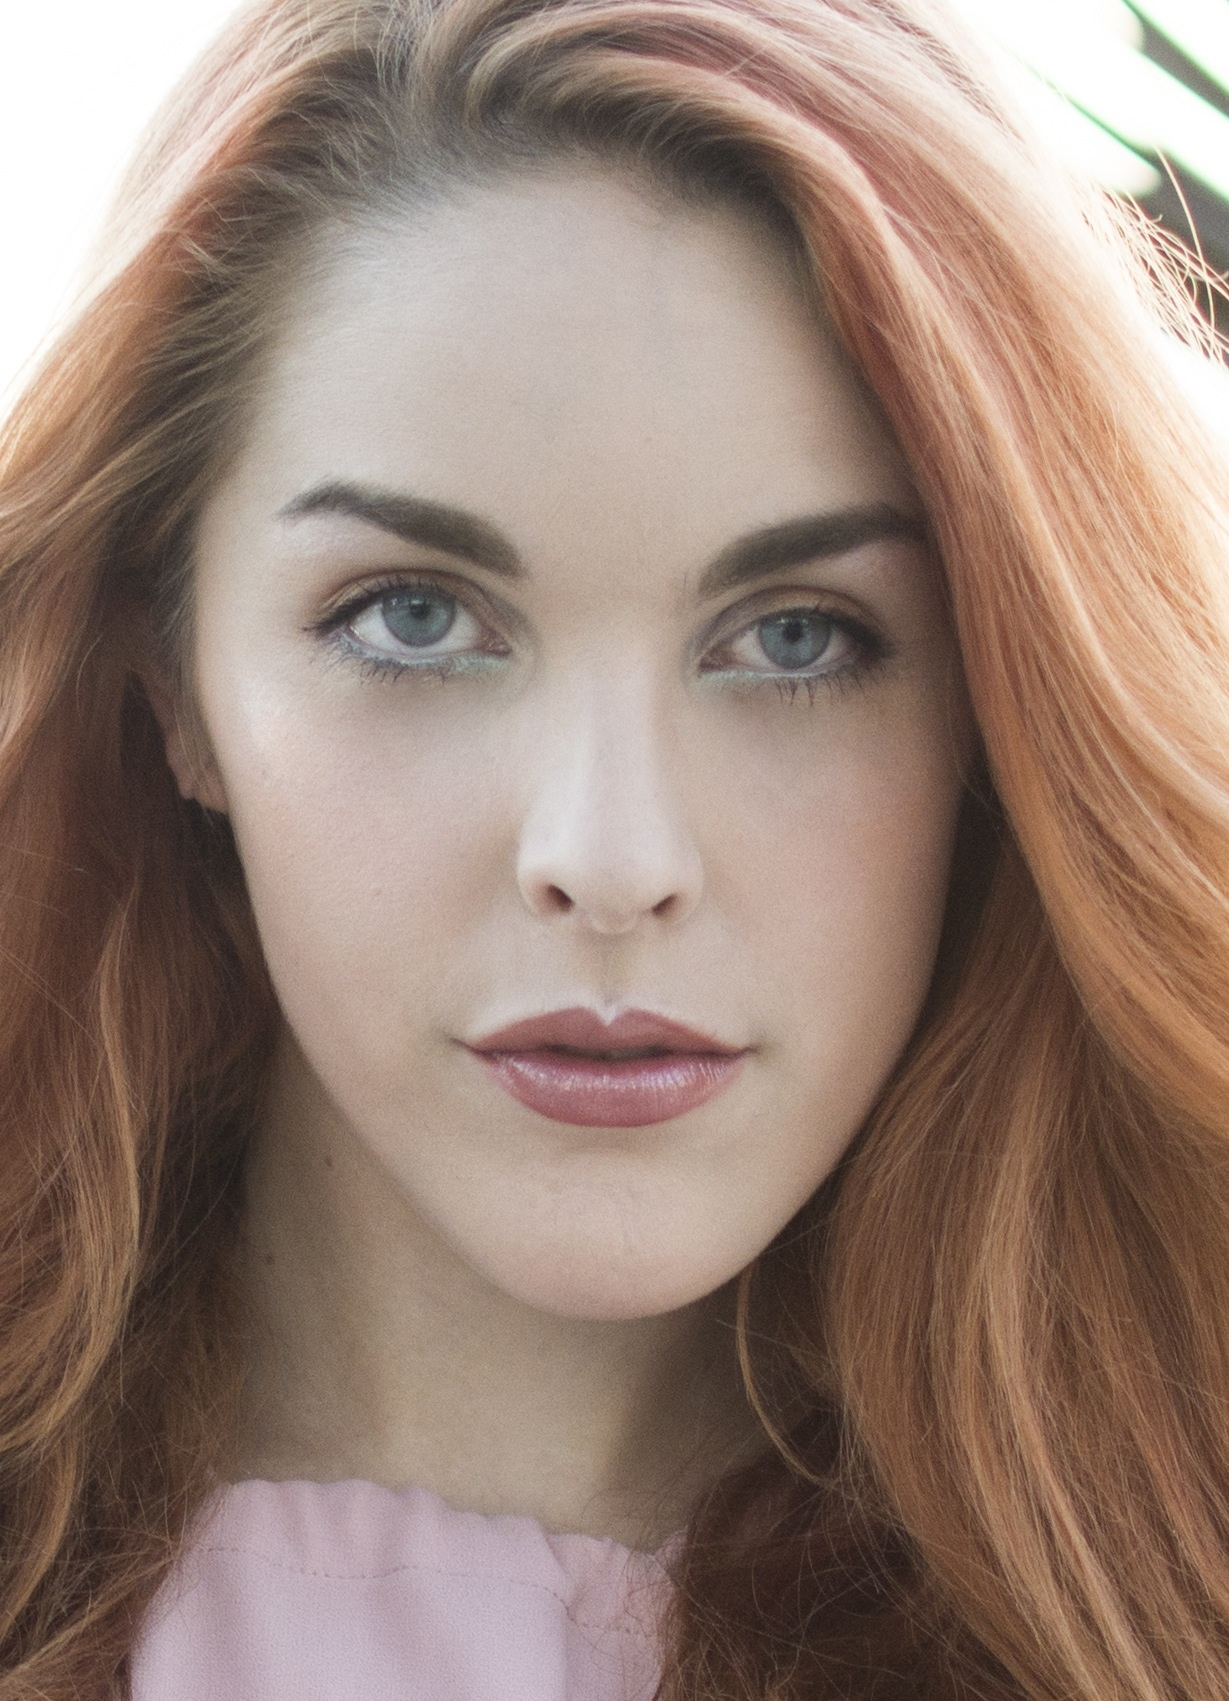 Armana Miller